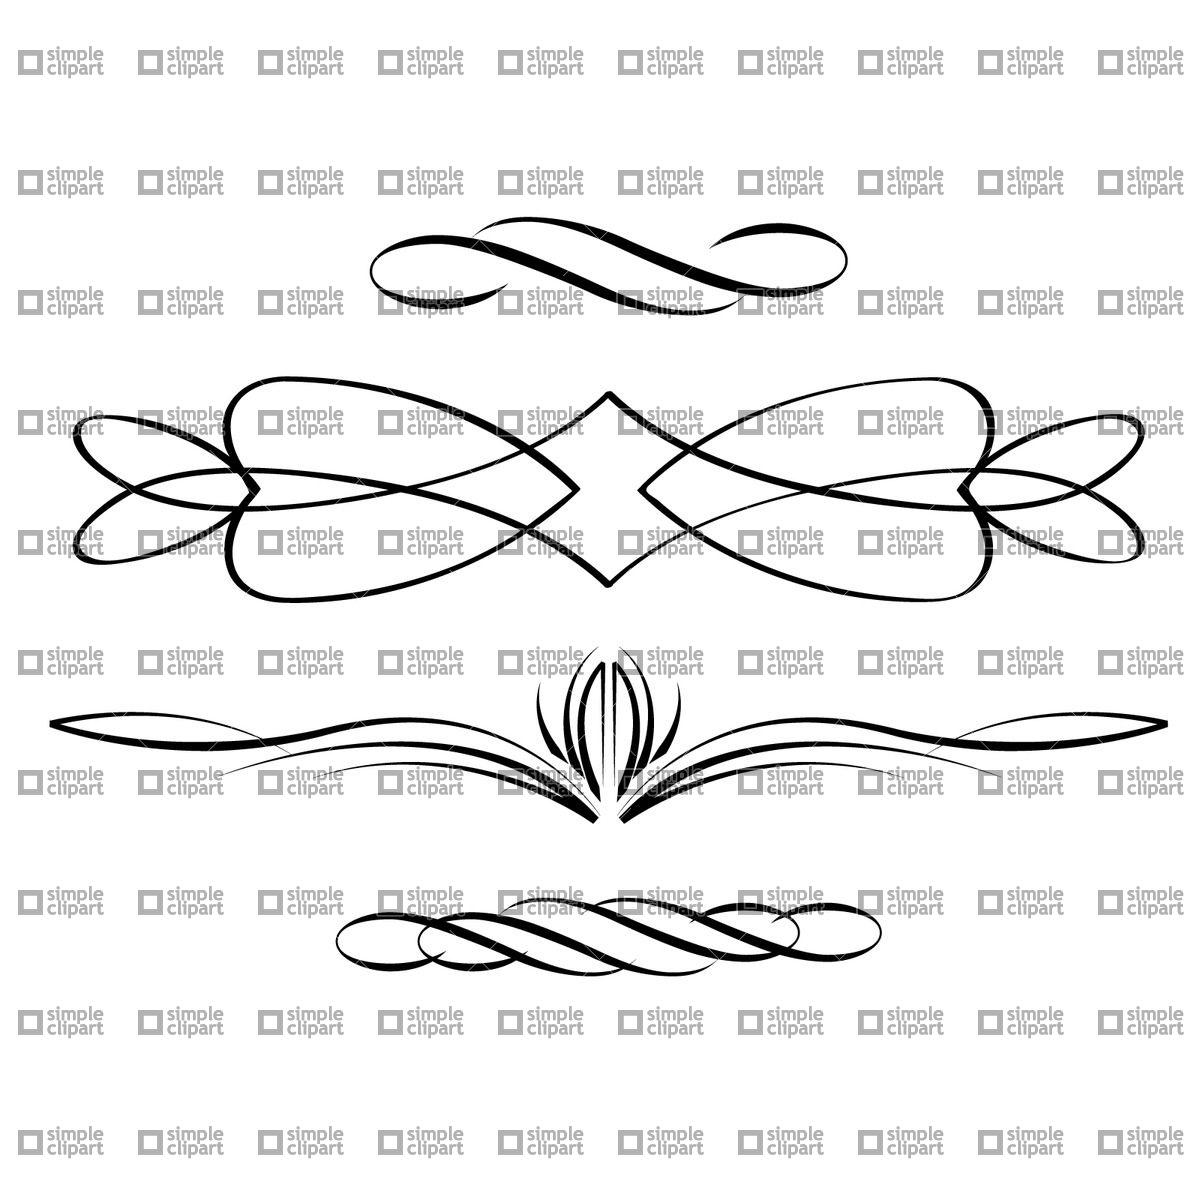 Calligraphic scrolls Vector Image #1869.